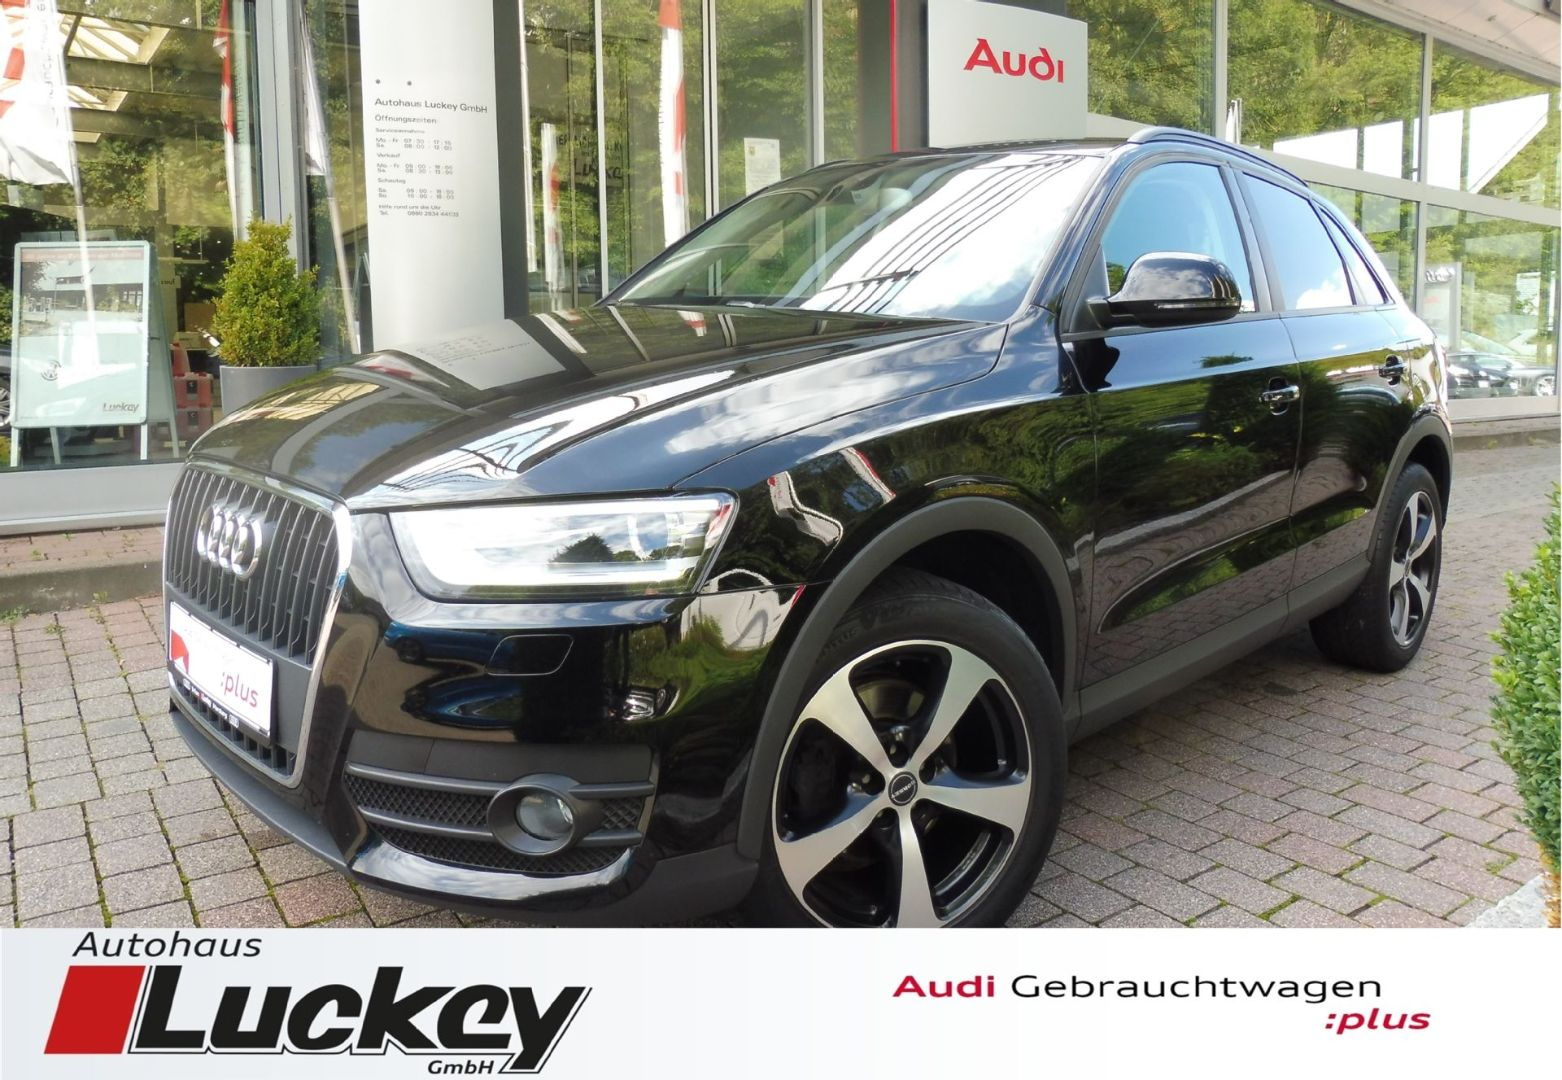 Audi Q3 2.0 TDI 6-Gang+XENON+Sitzheizung+APS++, Jahr 2012, Diesel